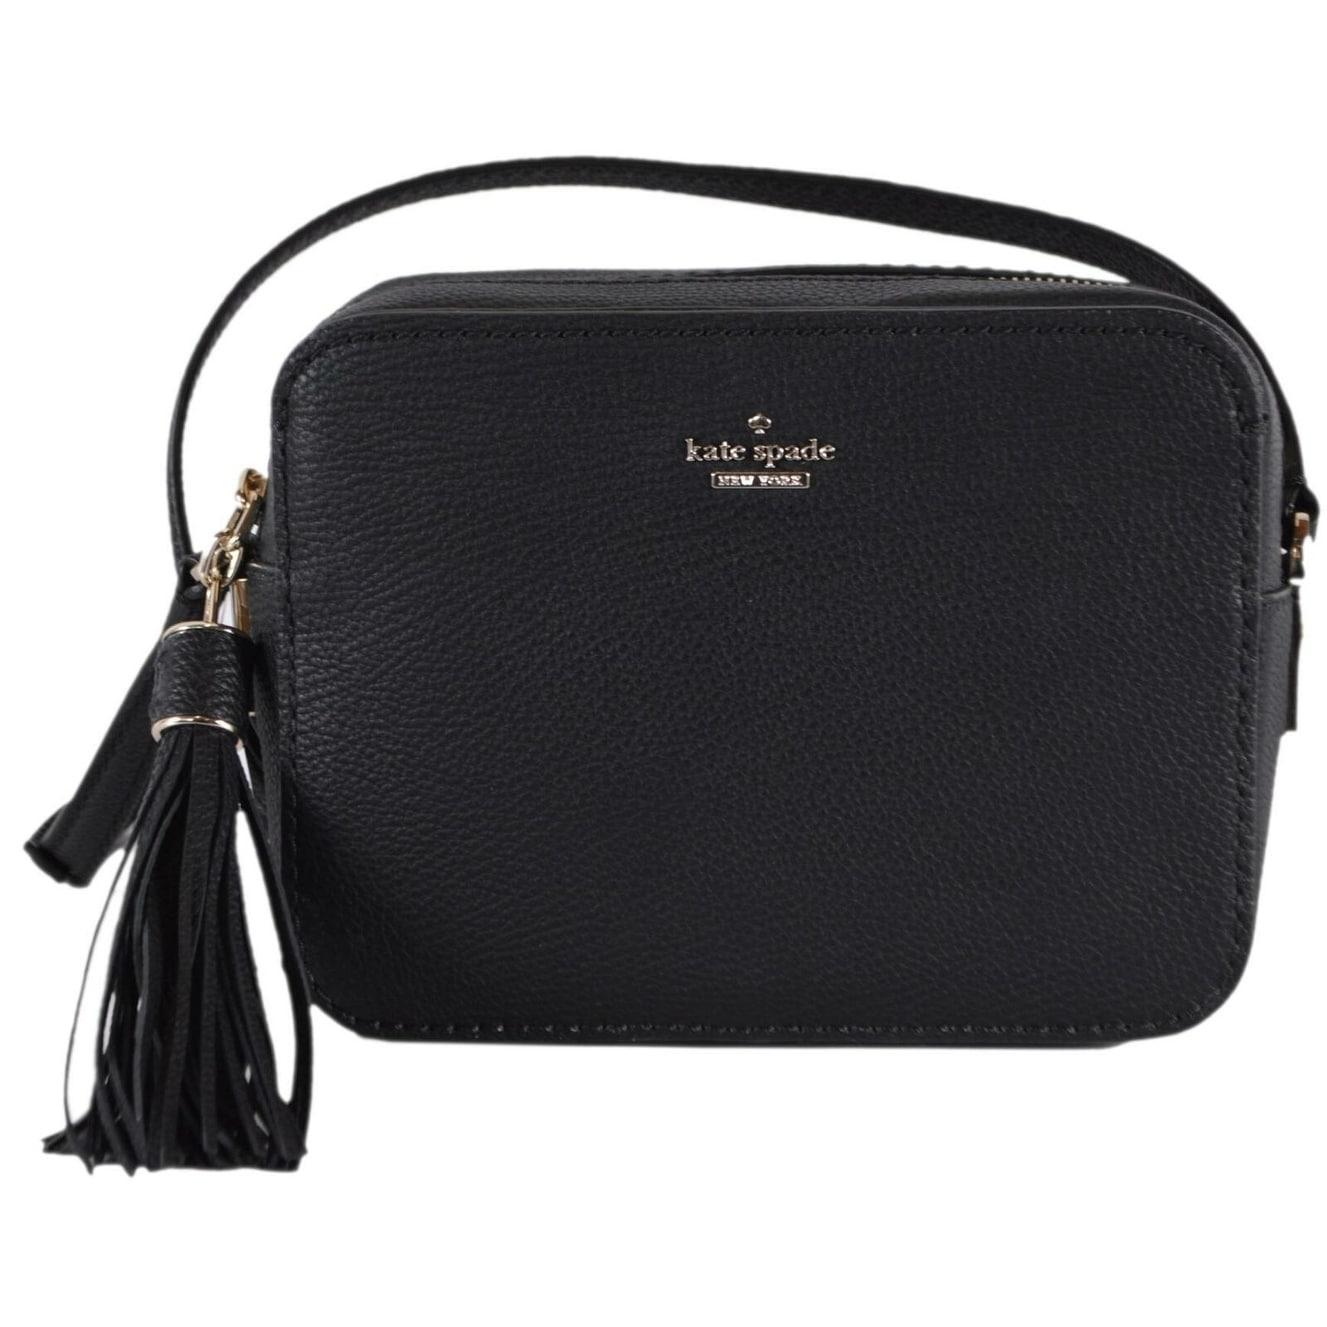 Kate Spade Black Leather Naomi Crossbody Camera Bag Purse